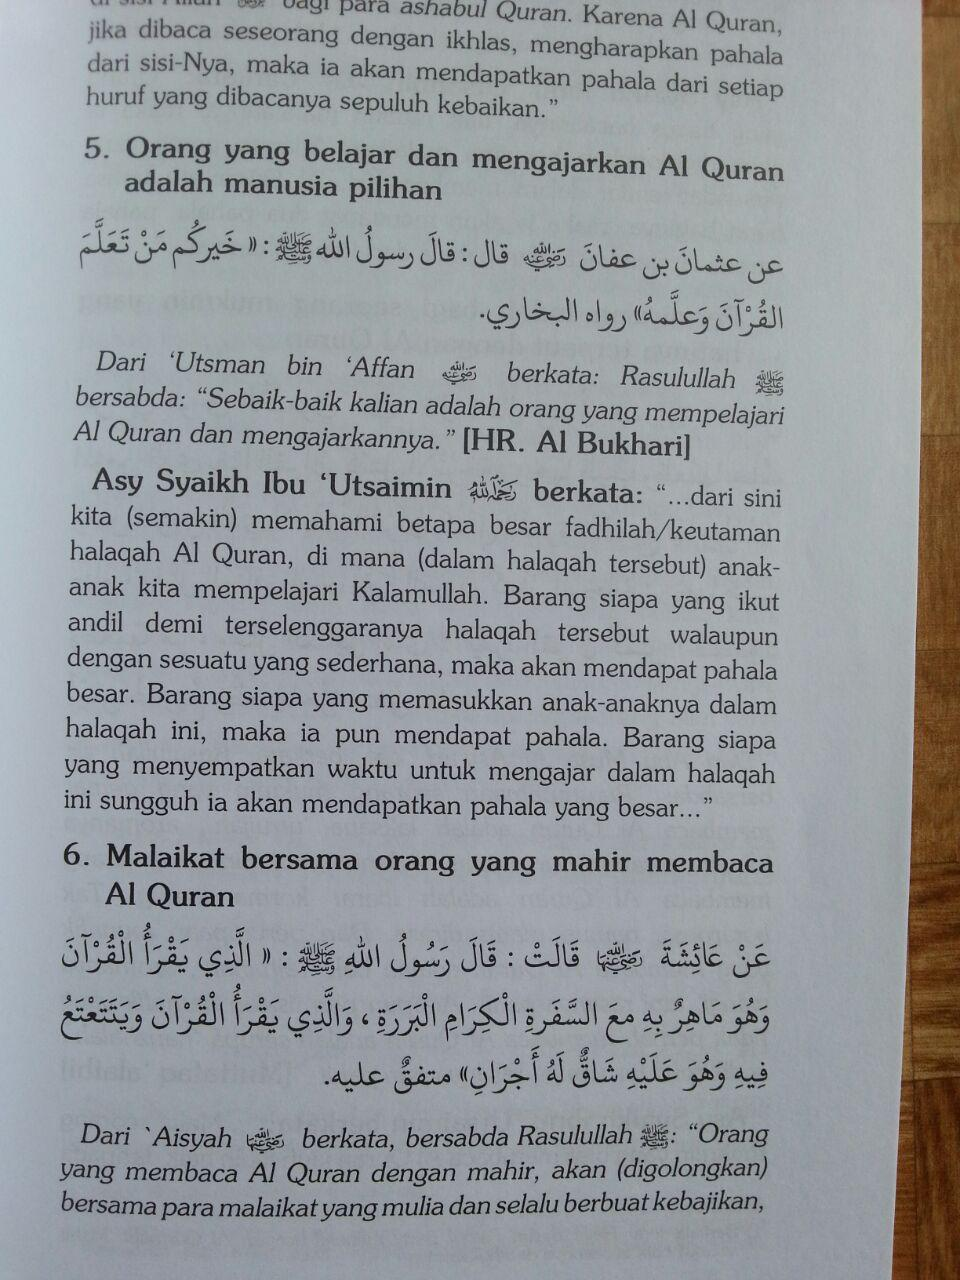 Buku Zadul Qori Bekal Membaca Kalam Ilahi isi